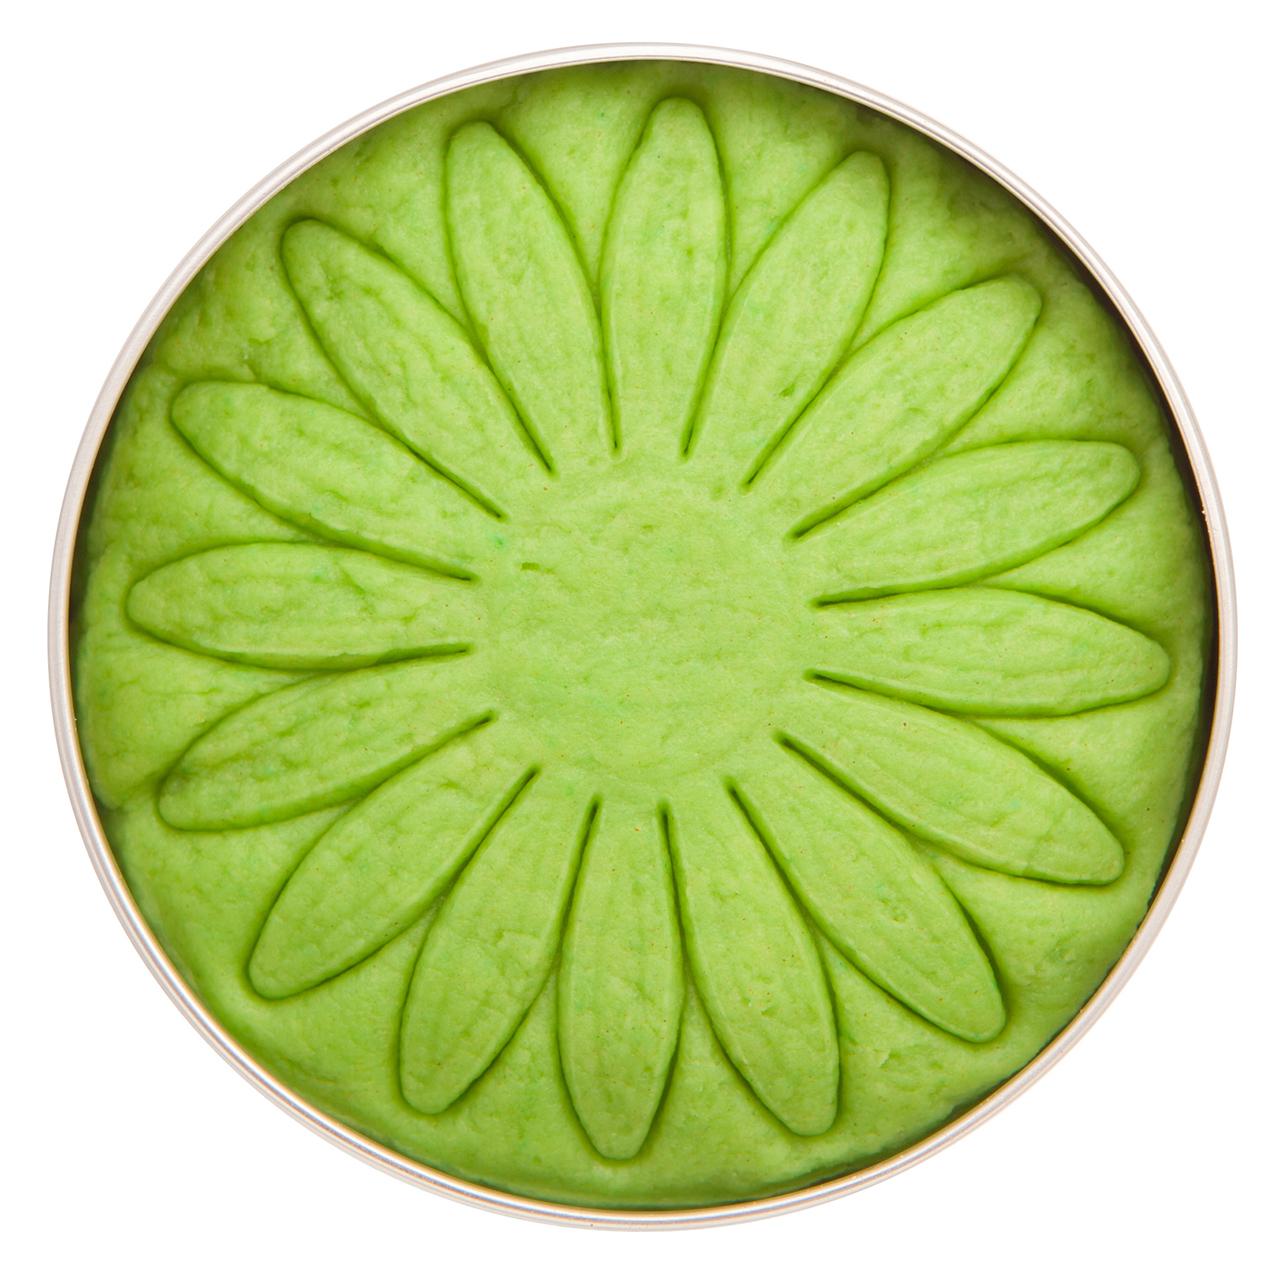 Dexterity Dough - 5 oz - Green Apple